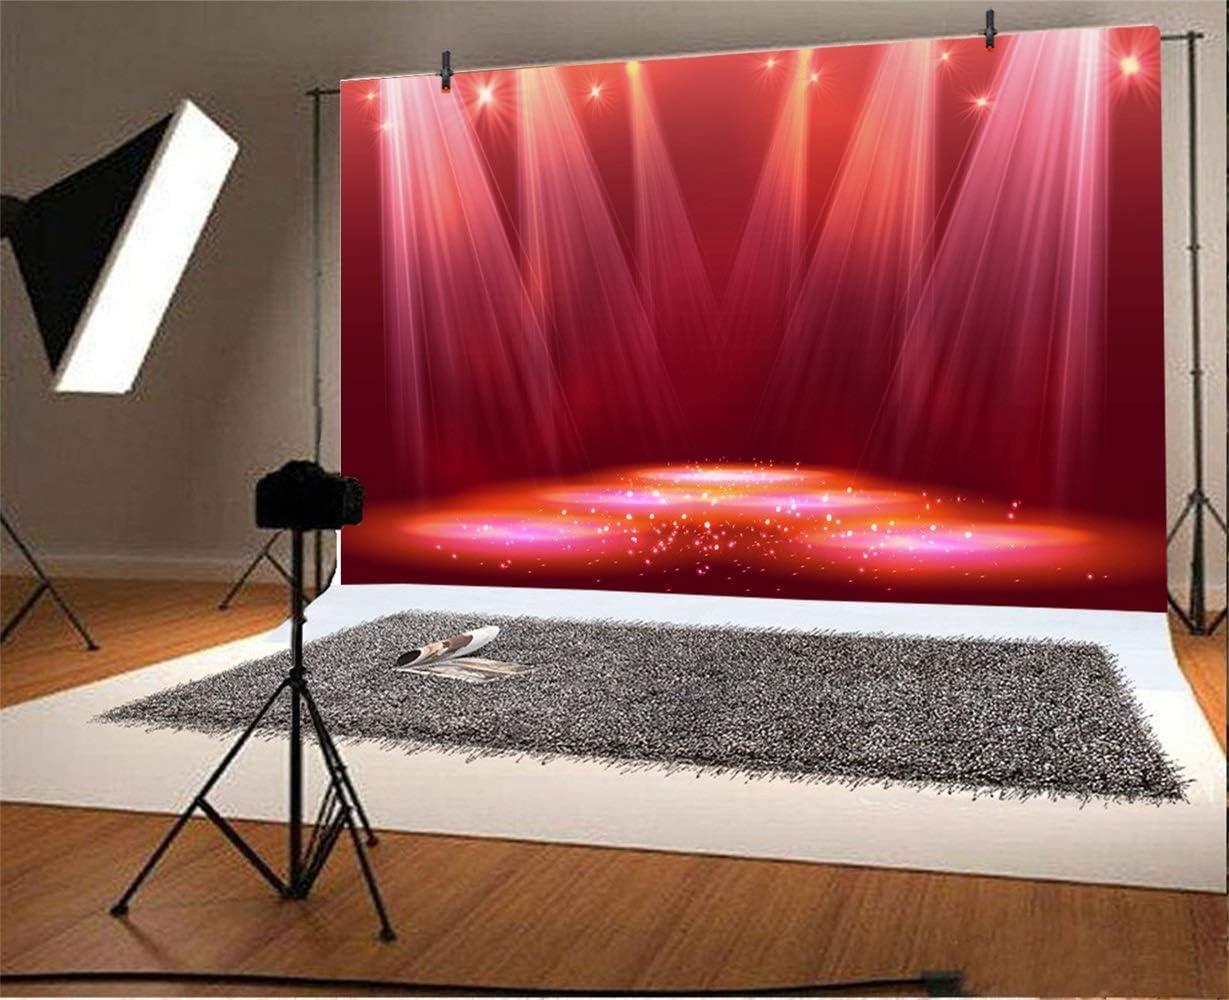 7x5ft Splendid Dreamlike Red Stage Backdrop Vinyl Dreamy Spotlights Light Beams Lightspots Beautiful Stage Background Talent Show Performance Live Show Shoot TV Programming Banner Studio Props